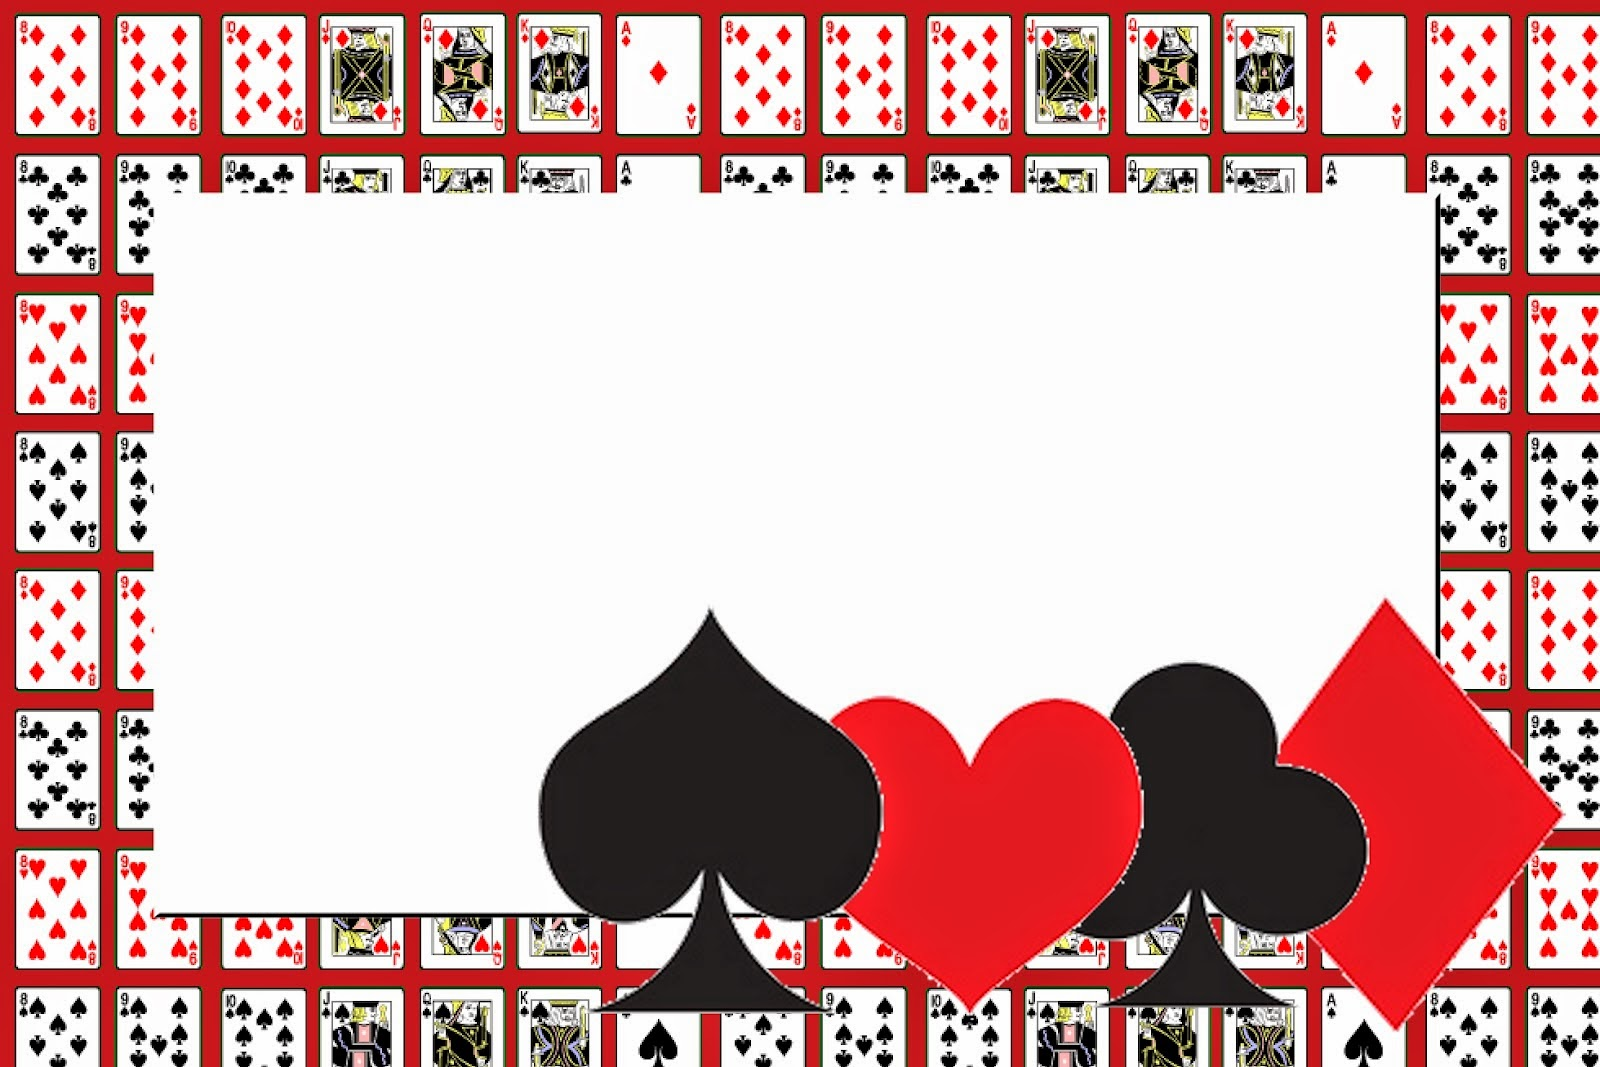 Americana blackjack 1xbet peliculas-314210